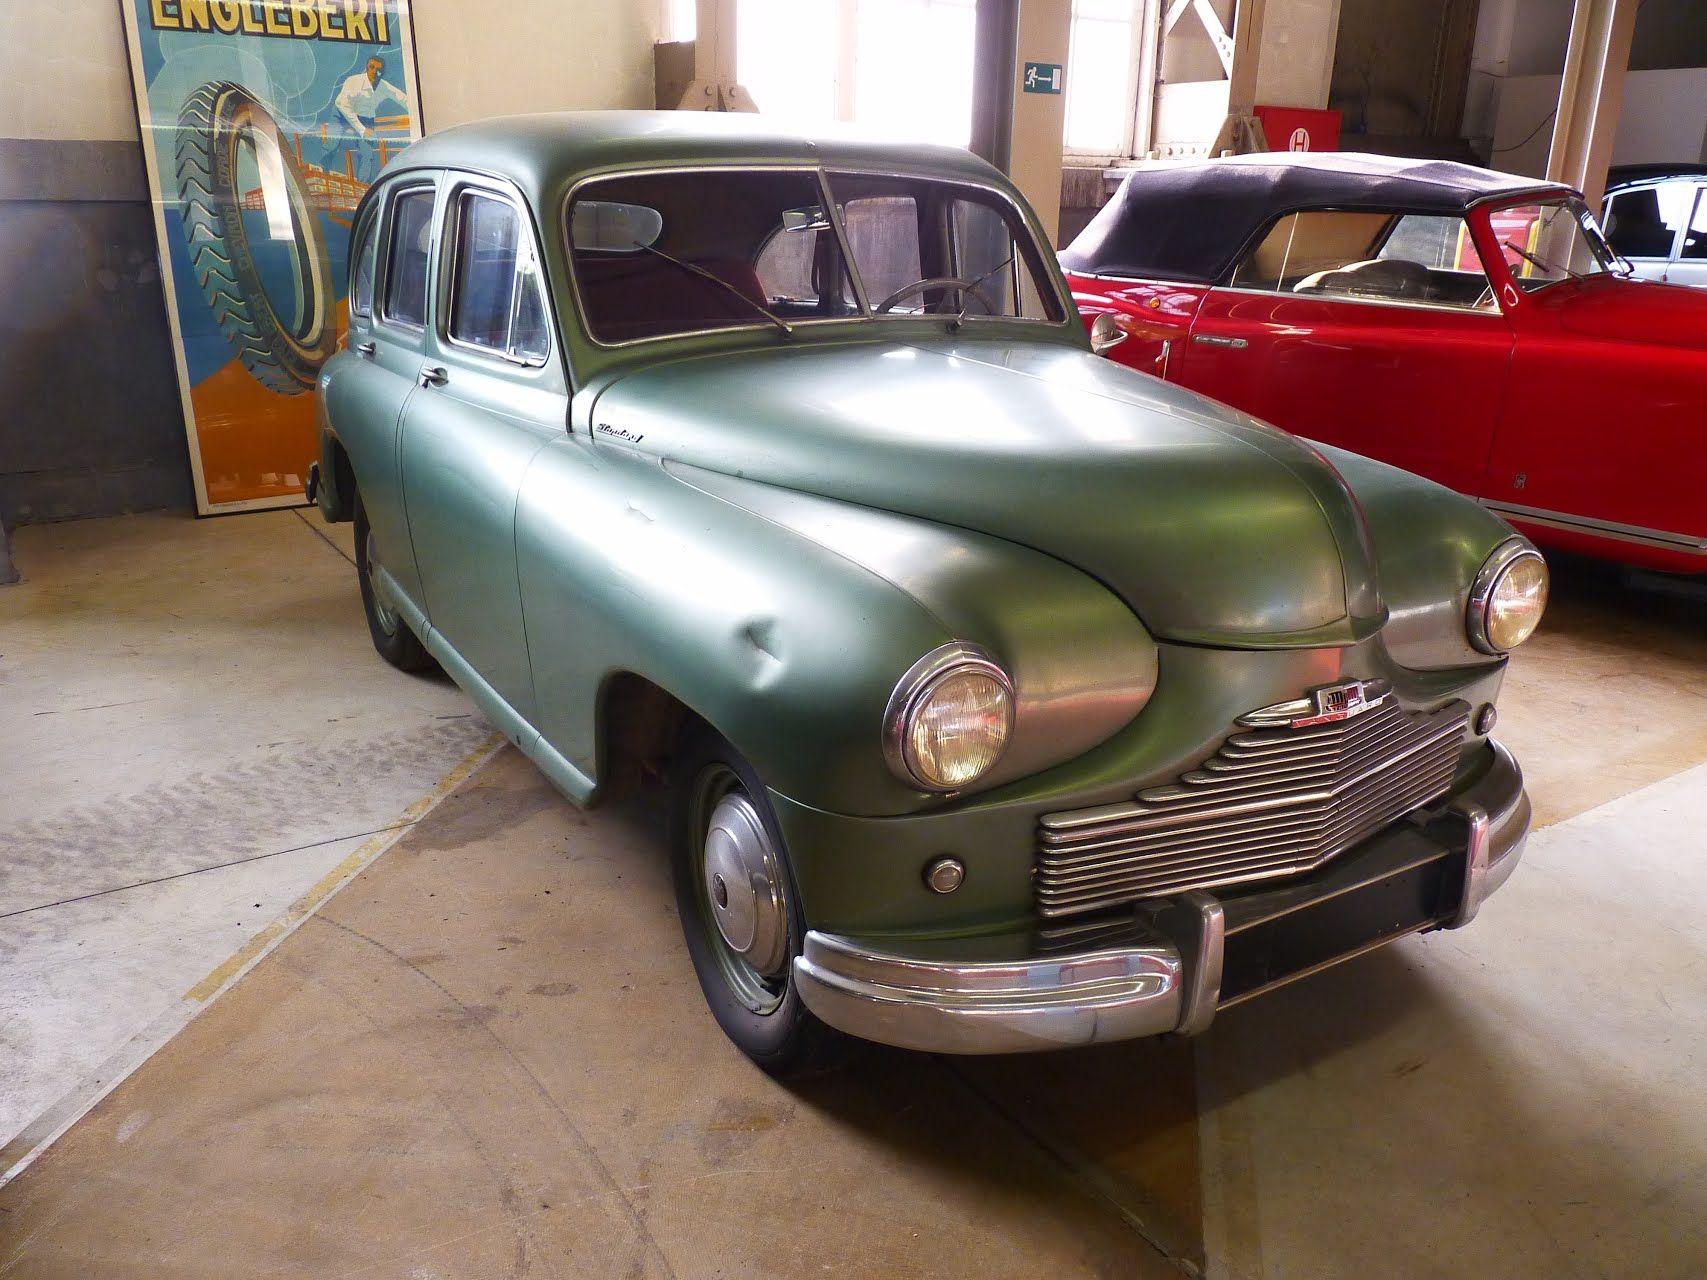 Standard Vanguard 1949 | Cars | Pinterest | Cars